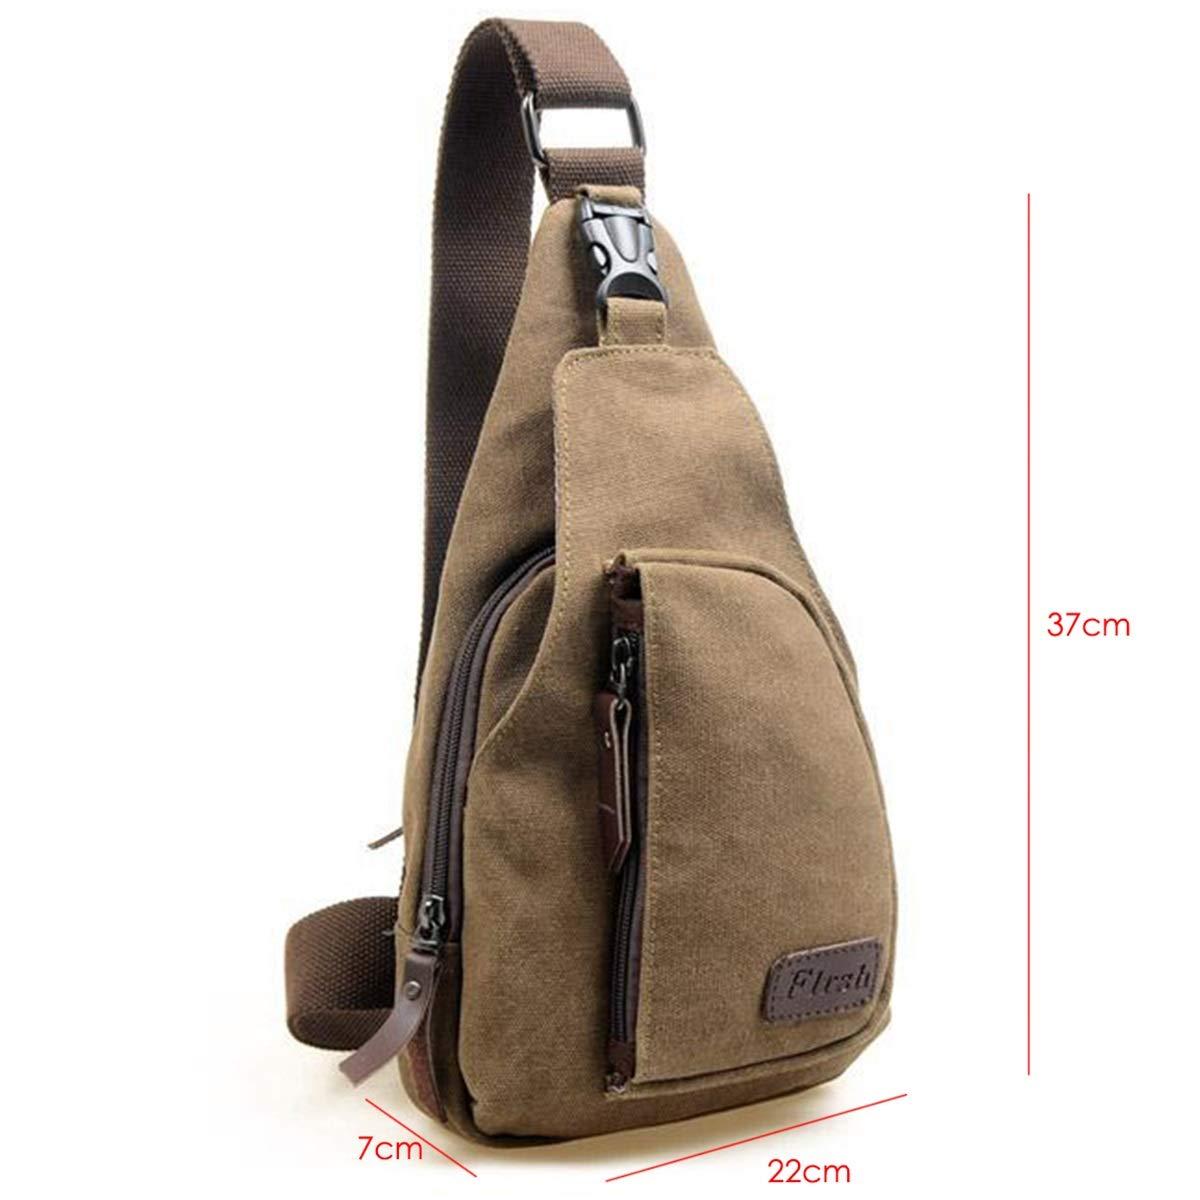 Yunhany Direct Vintage Mens Military Canvas Satchel Outdoor Shoulder Bag Messenger Travel Bag-Two Sizes Color : Black, Size : L